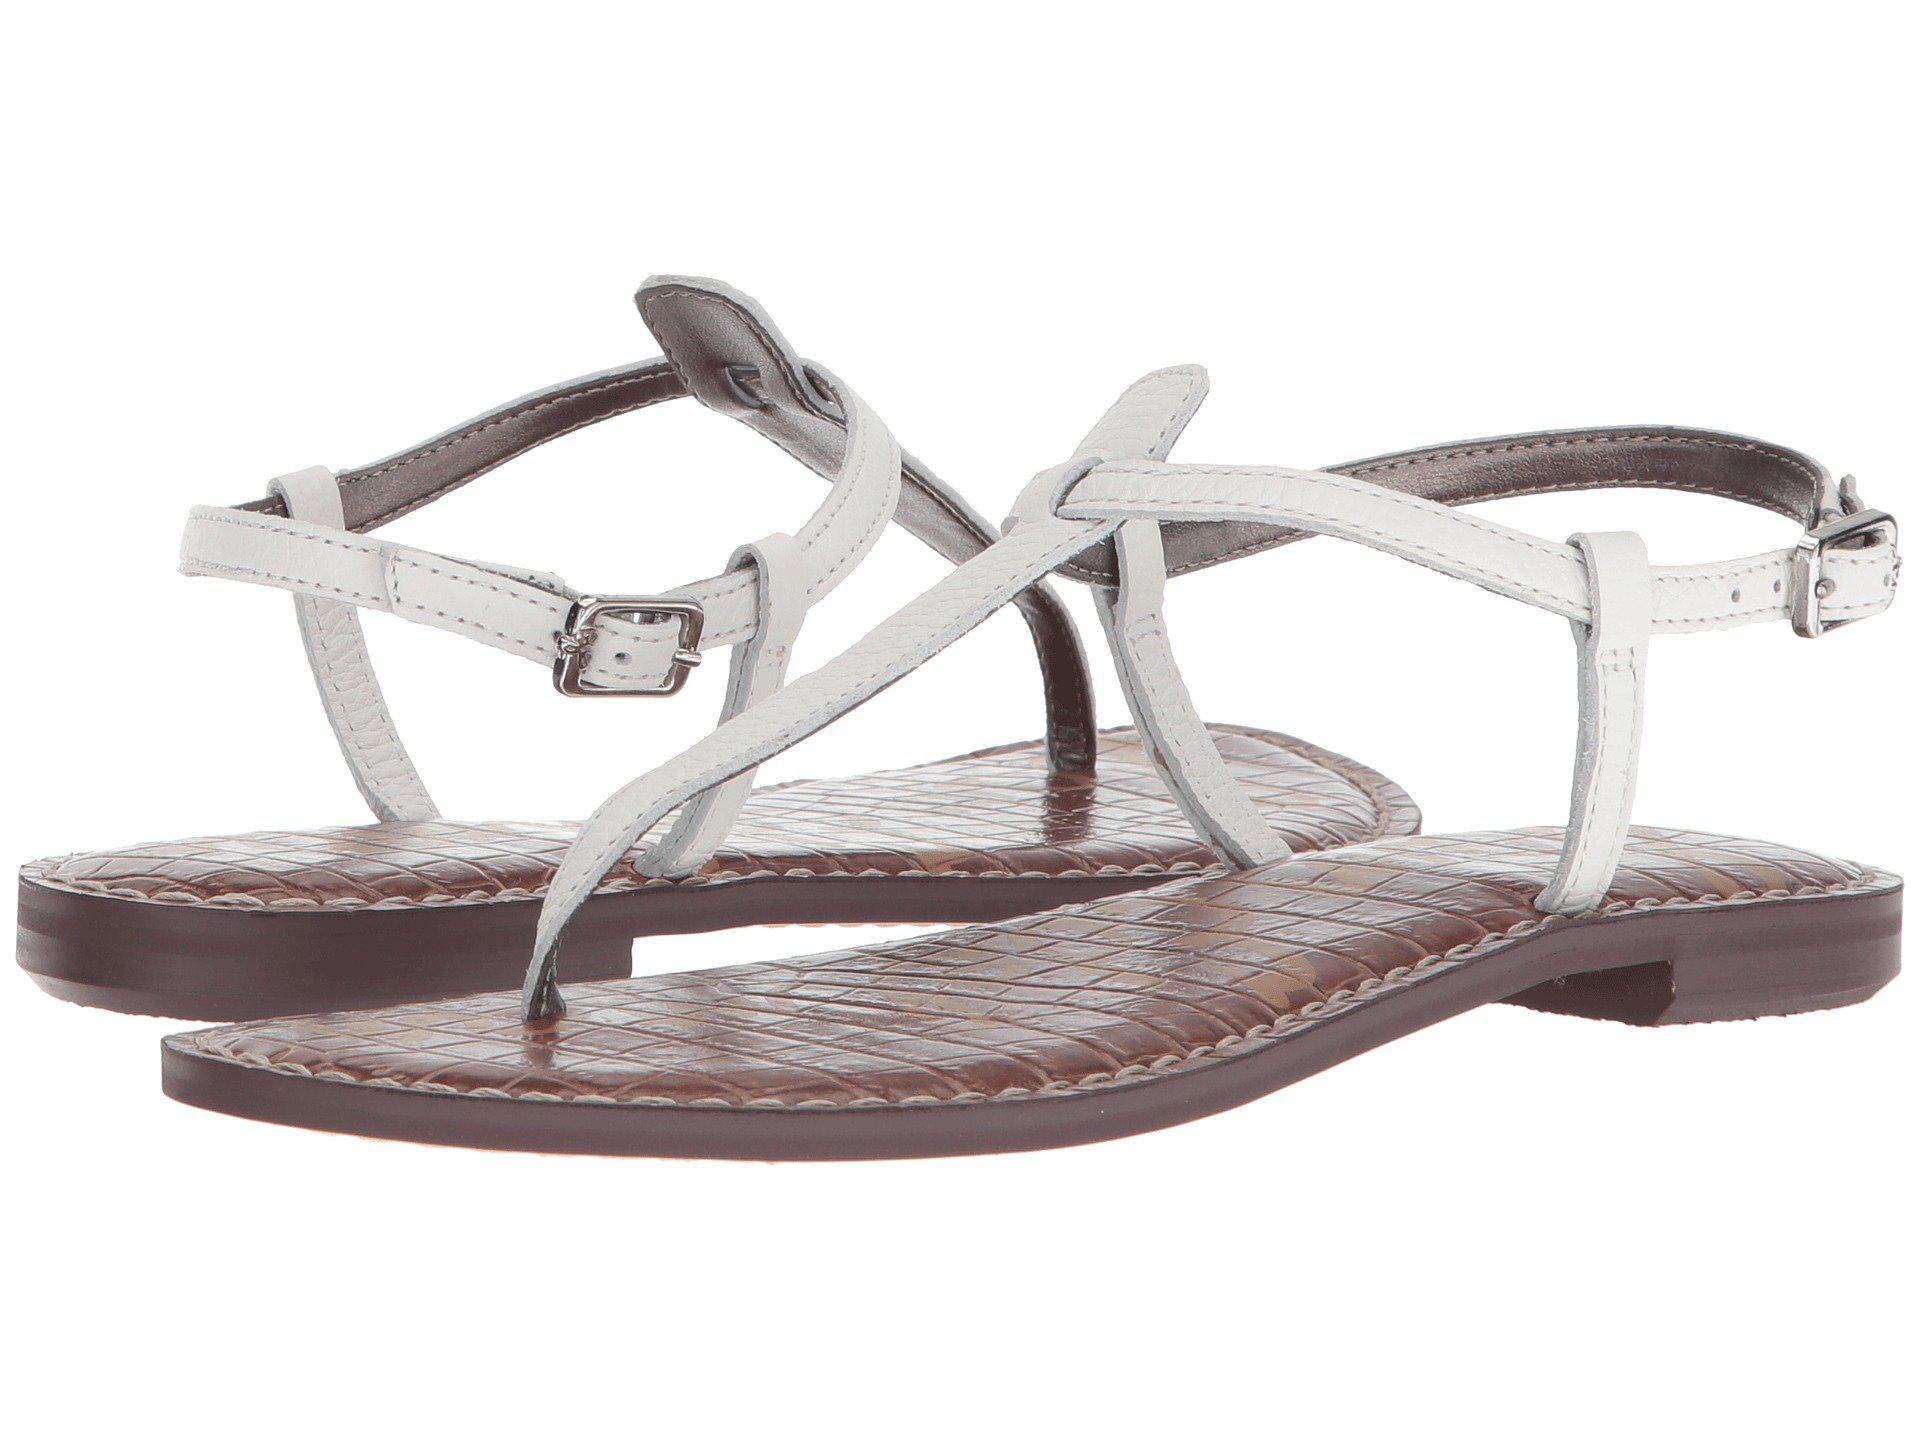 b7e4a97ace20 Lyst - Sam Edelman Gigi (saddle) Women s Sandals